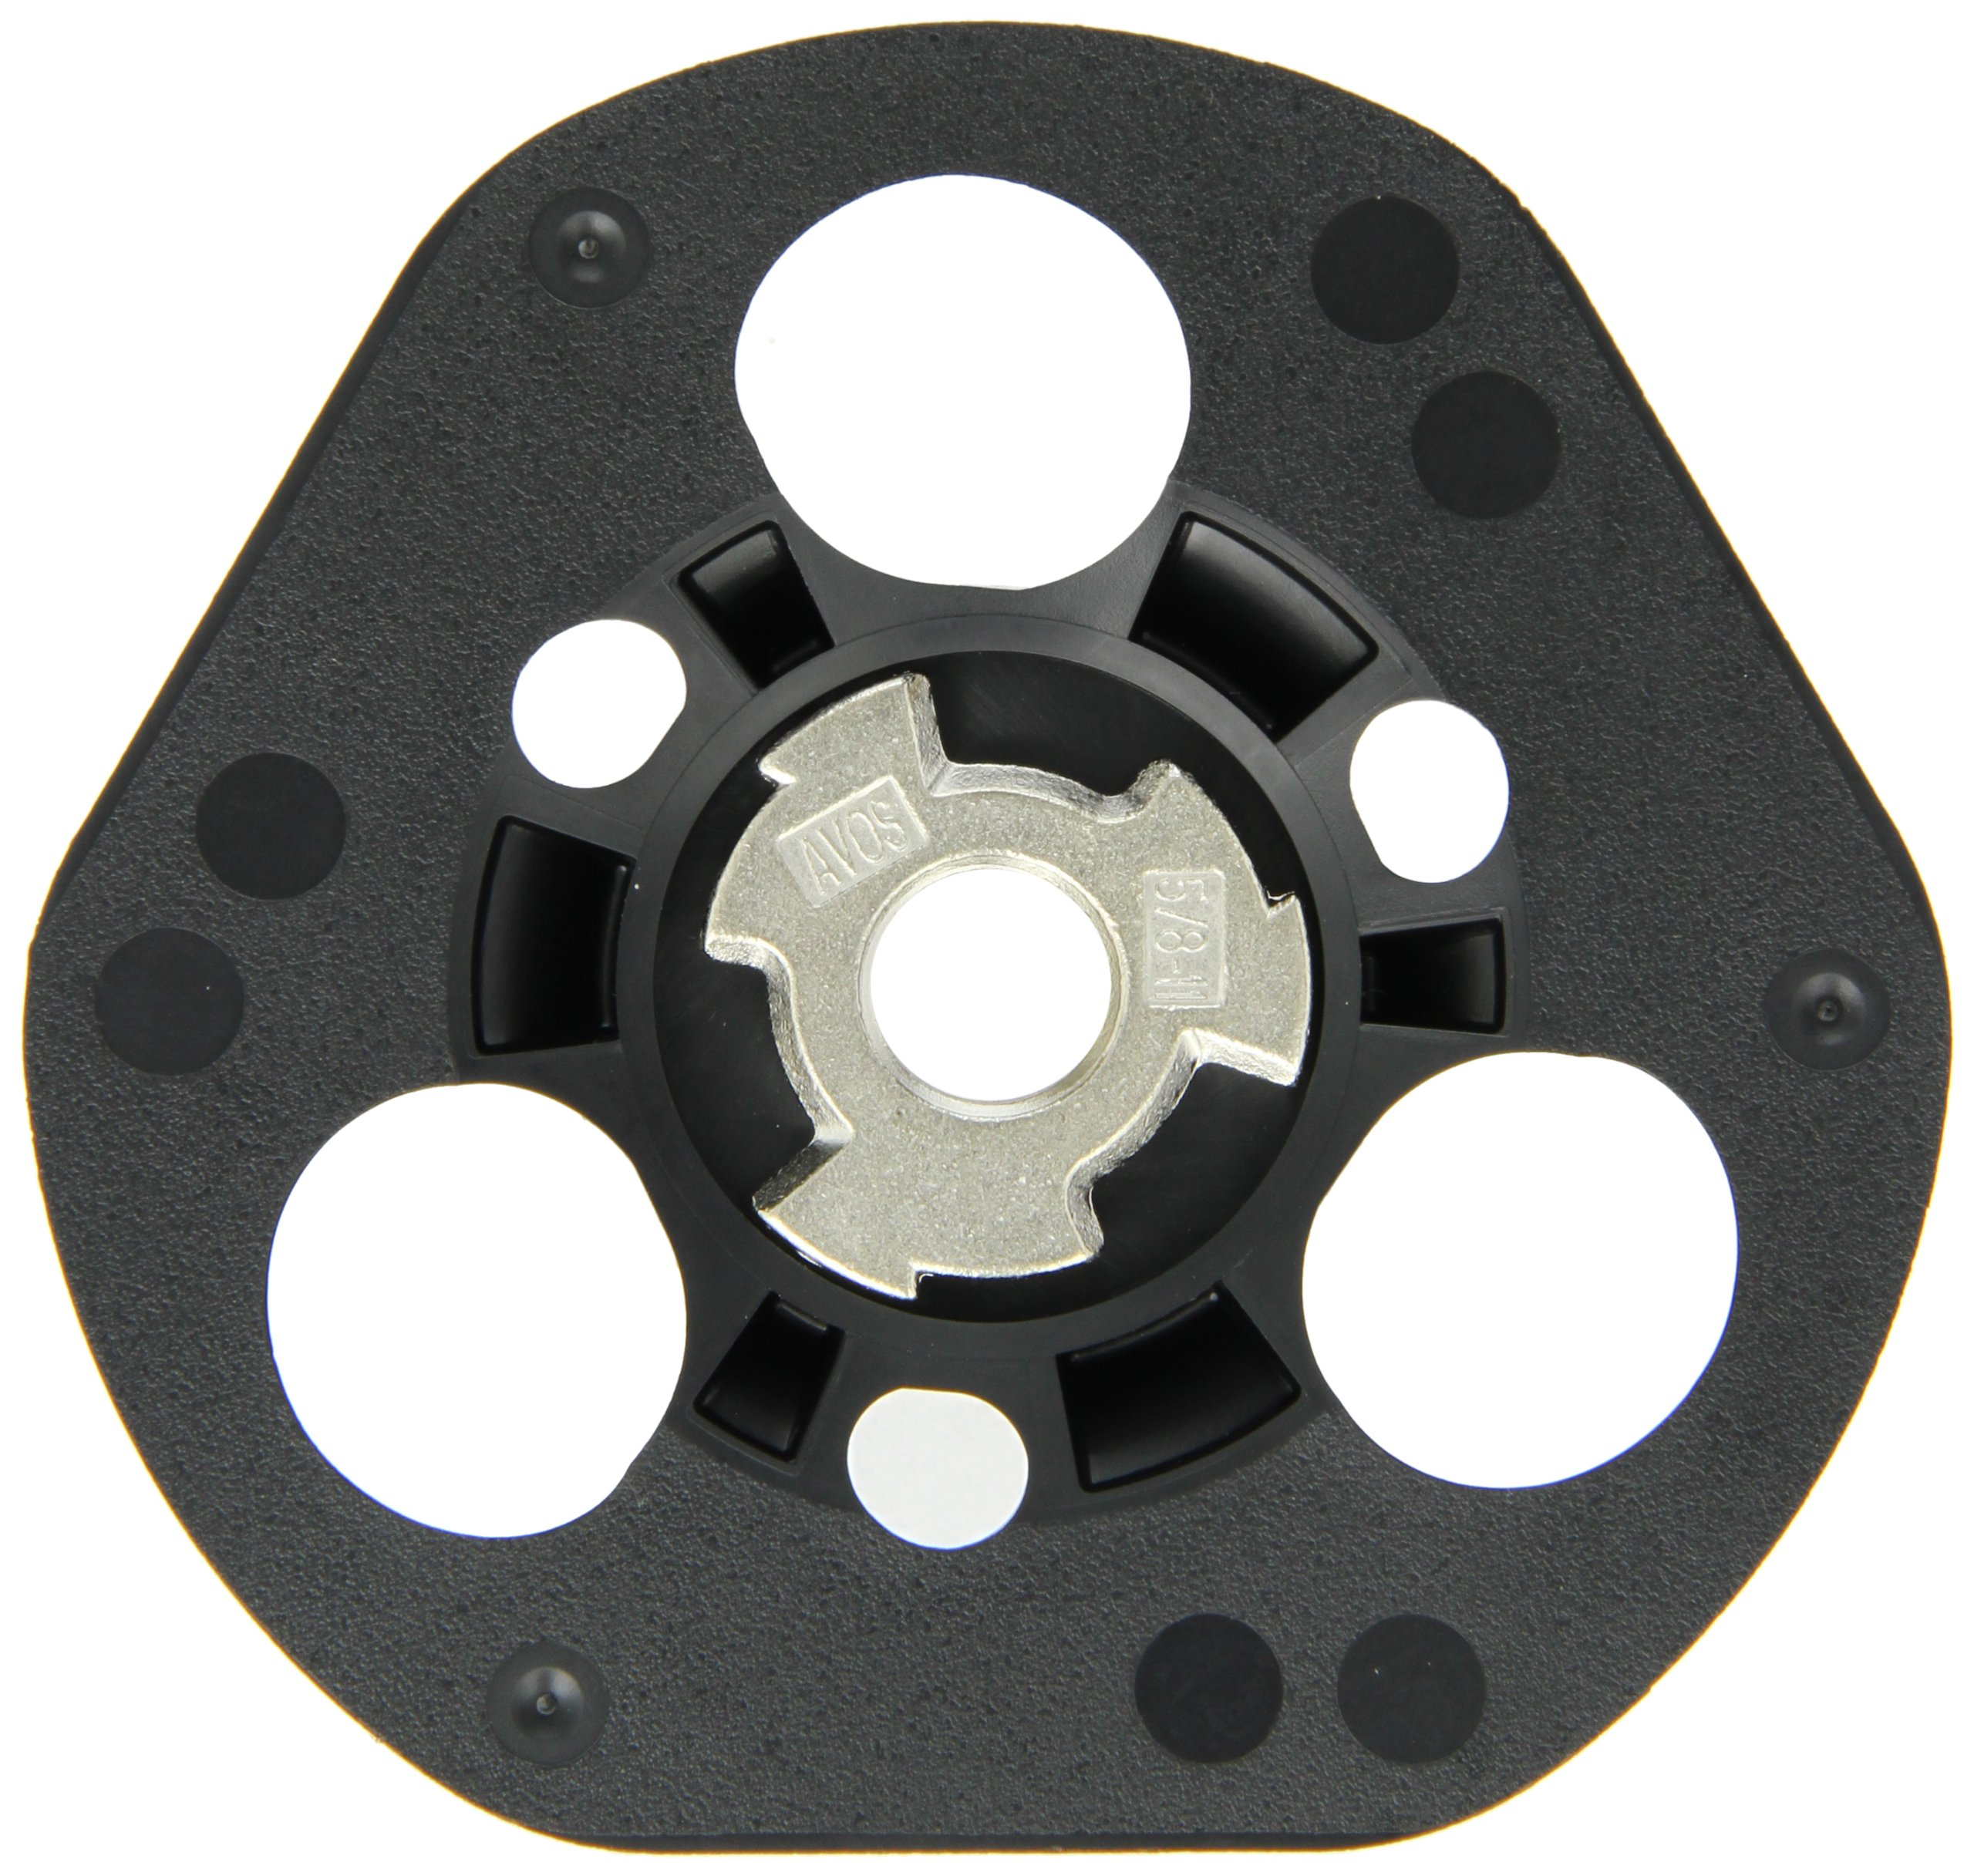 Norton AVOS Edger Speed-Lok Back-up Pad, 4-1/2'' Diameter, 5/8''-11 Sawtooth Arbor, 13000 rpm (Pack of 5)